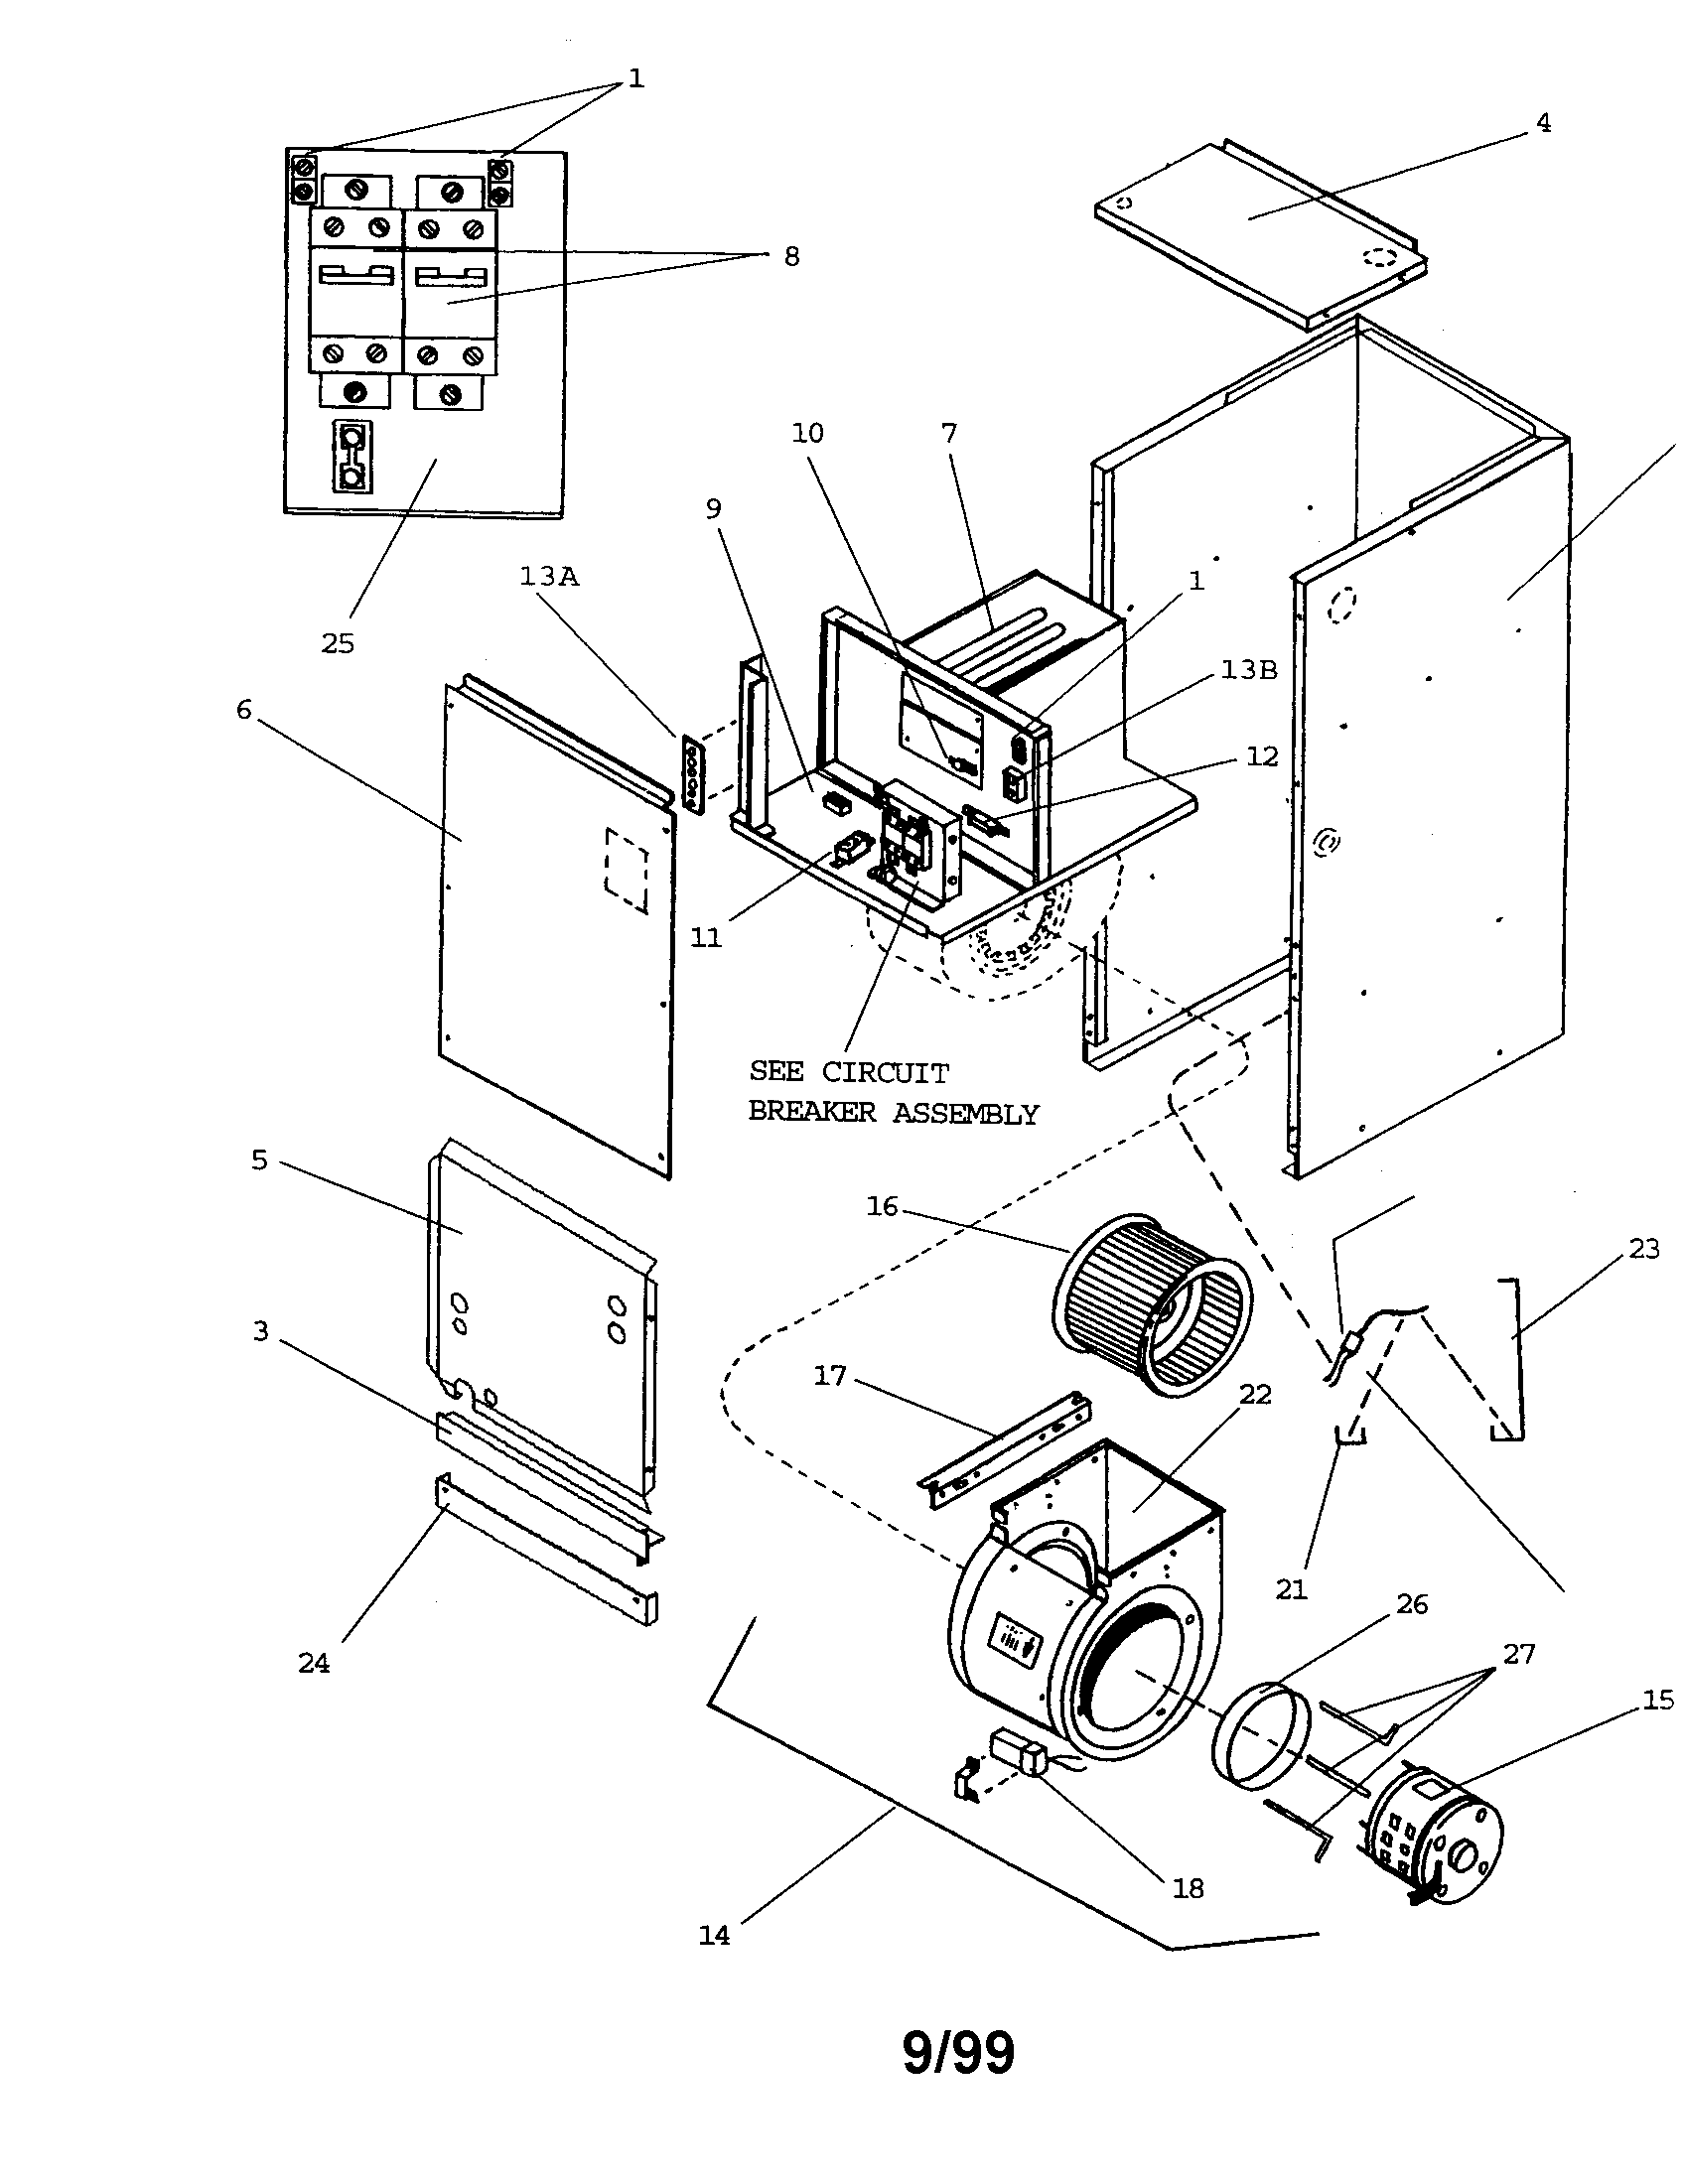 goodman air handler parts diagram wiring diagrams for trane air handler parts diagram air handler parts diagram [ 1696 x 2200 Pixel ]